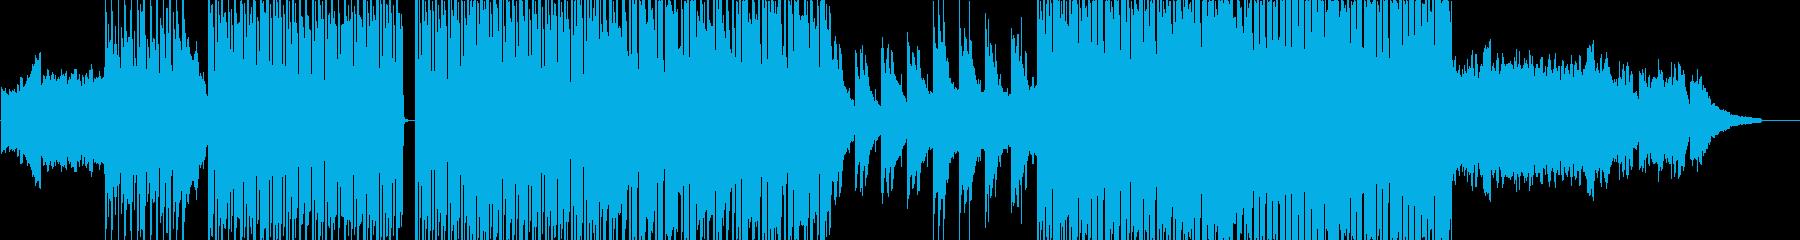 STANDARD永久不滅なポップスの再生済みの波形